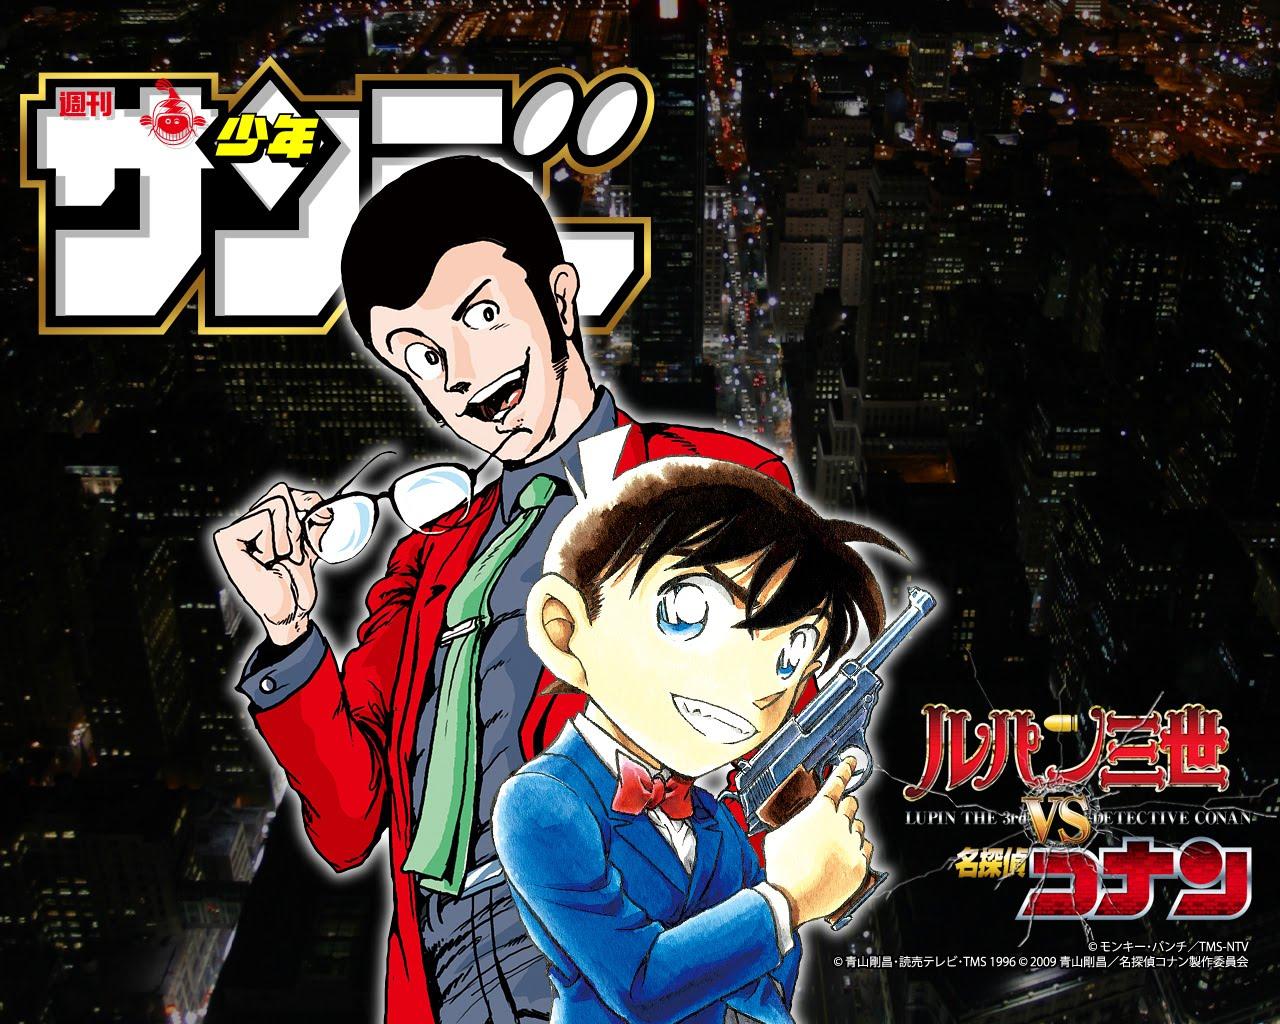 Lupin III vs Detective Conan Lupin-iii-vs-conan-wallpaper